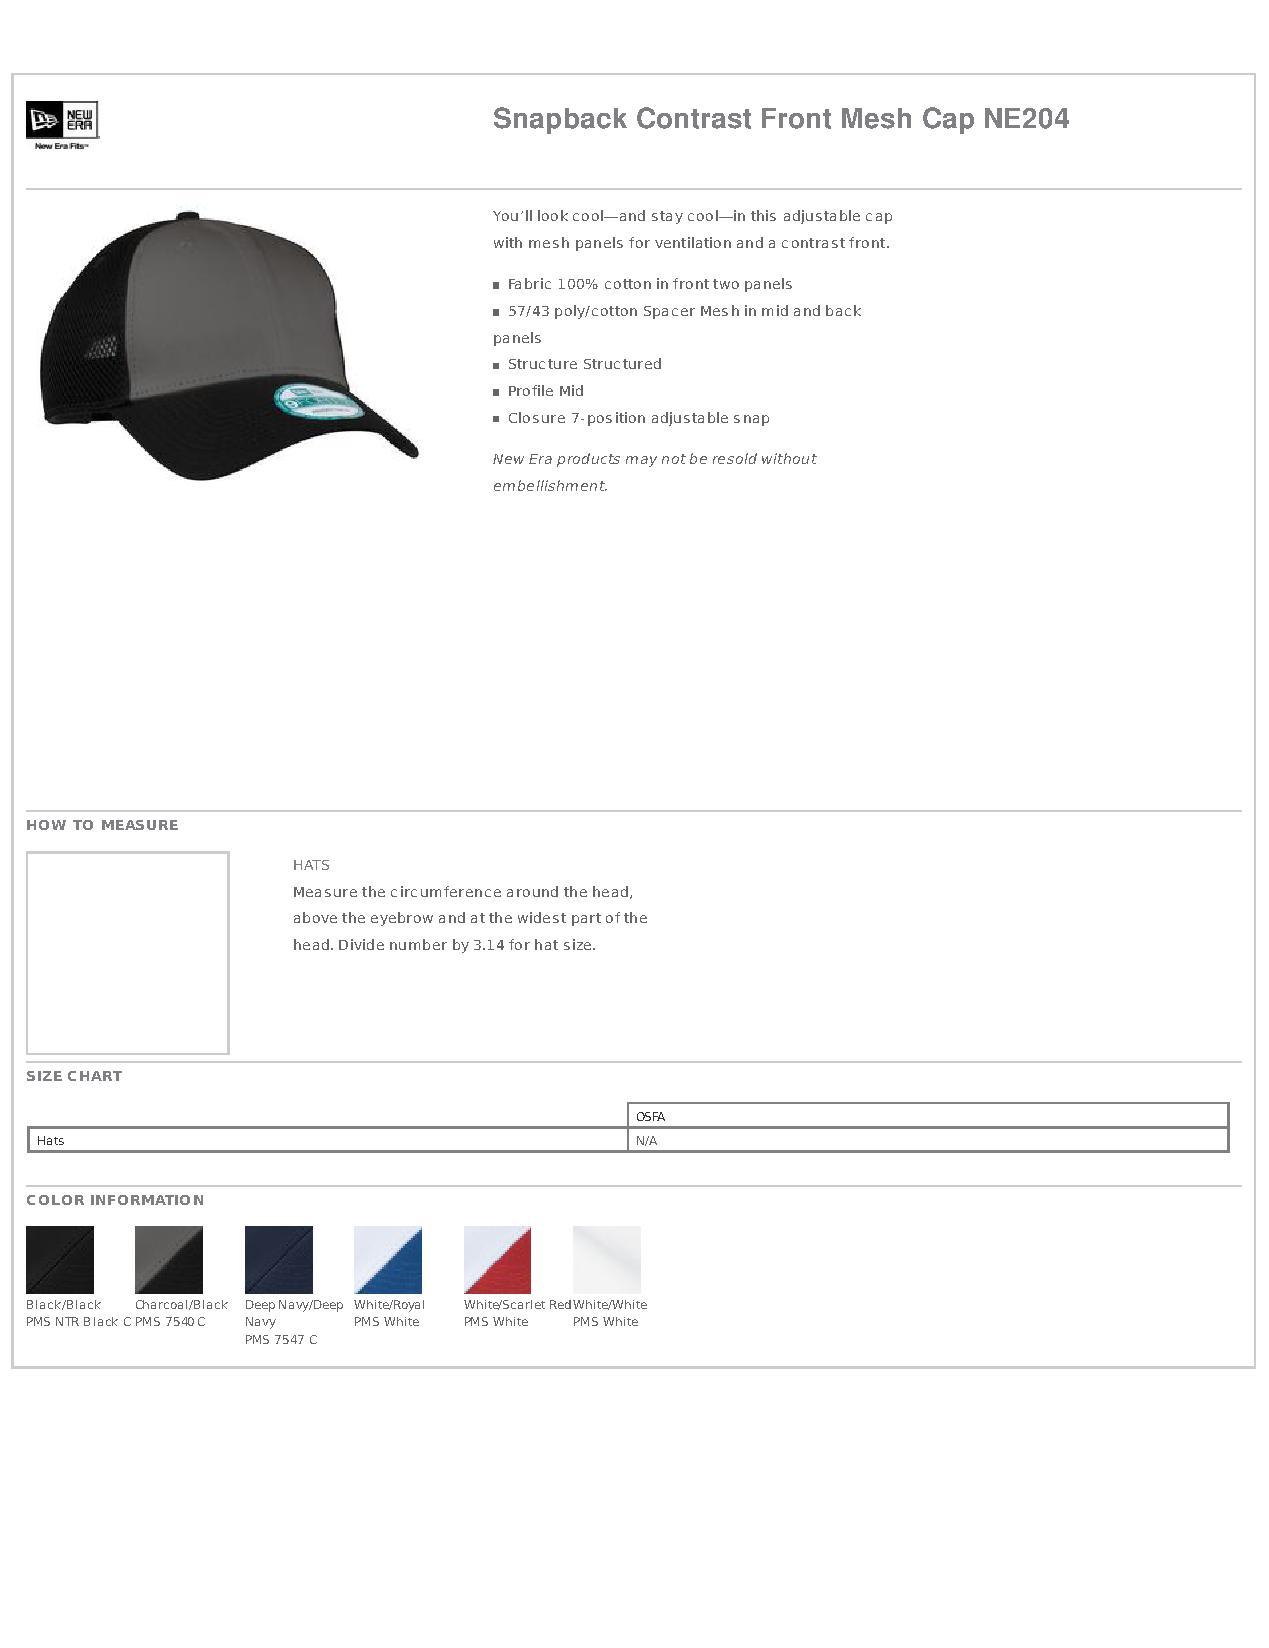 0ff53b37a New Era® NE204 Snapback Contrast Front Mesh Cap - Headwear